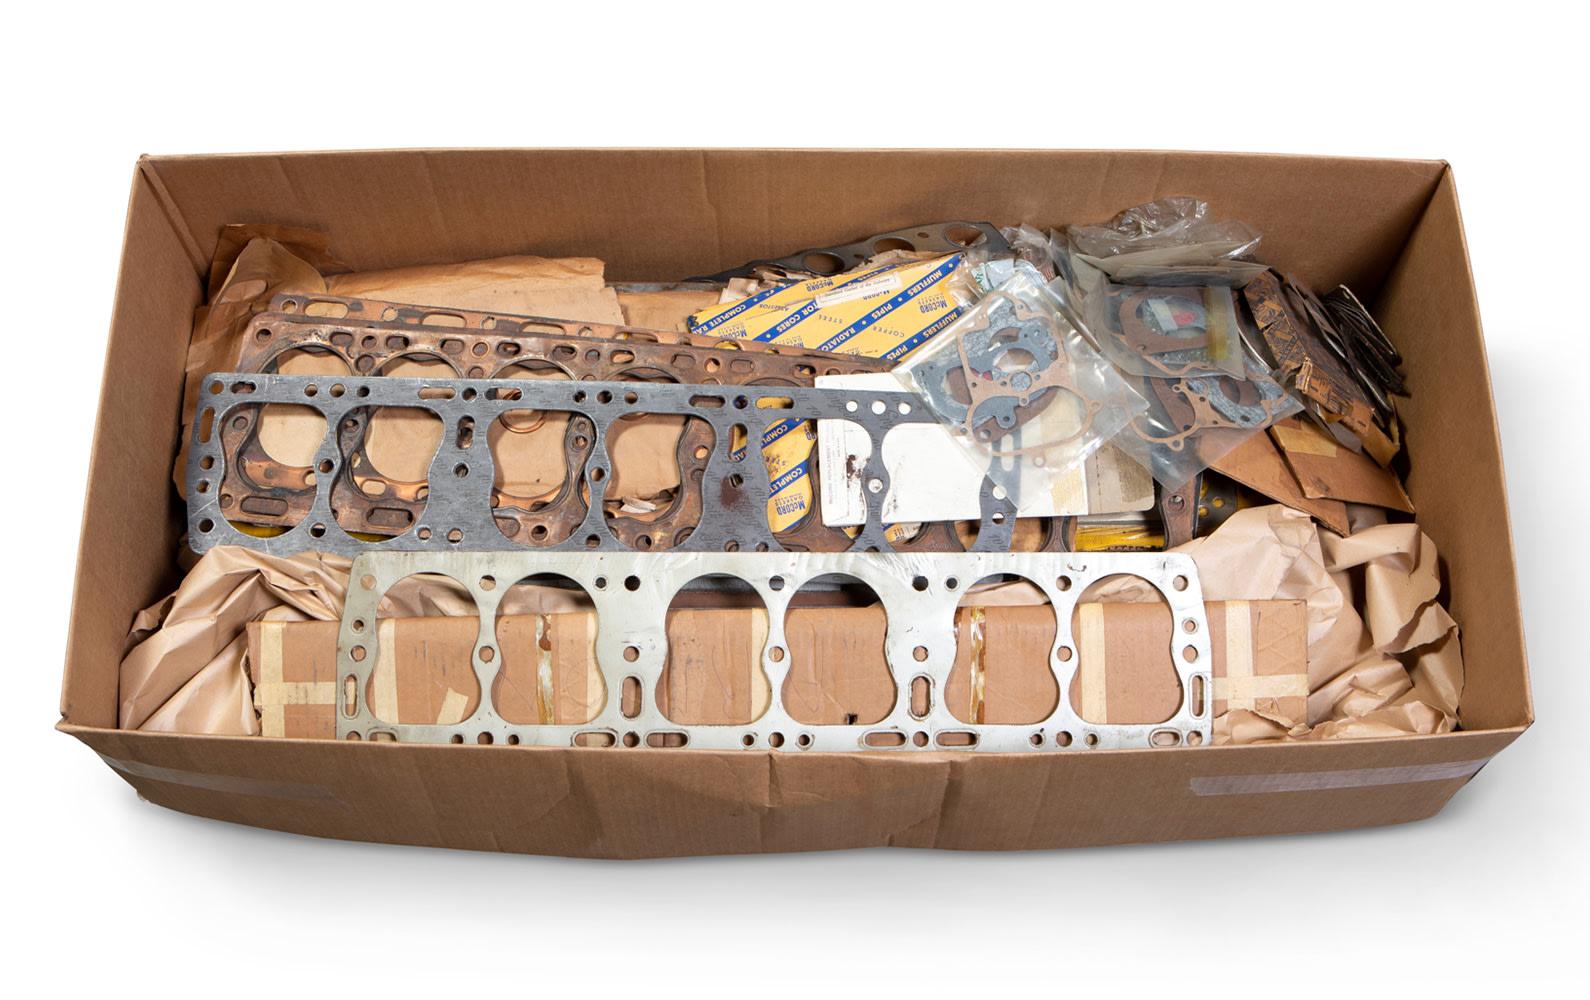 Prod/O21E - Phil Hill C 2021/C0150_Various Engine Gaskets/C0150_Engine_Gaskets_3_jvx0ct